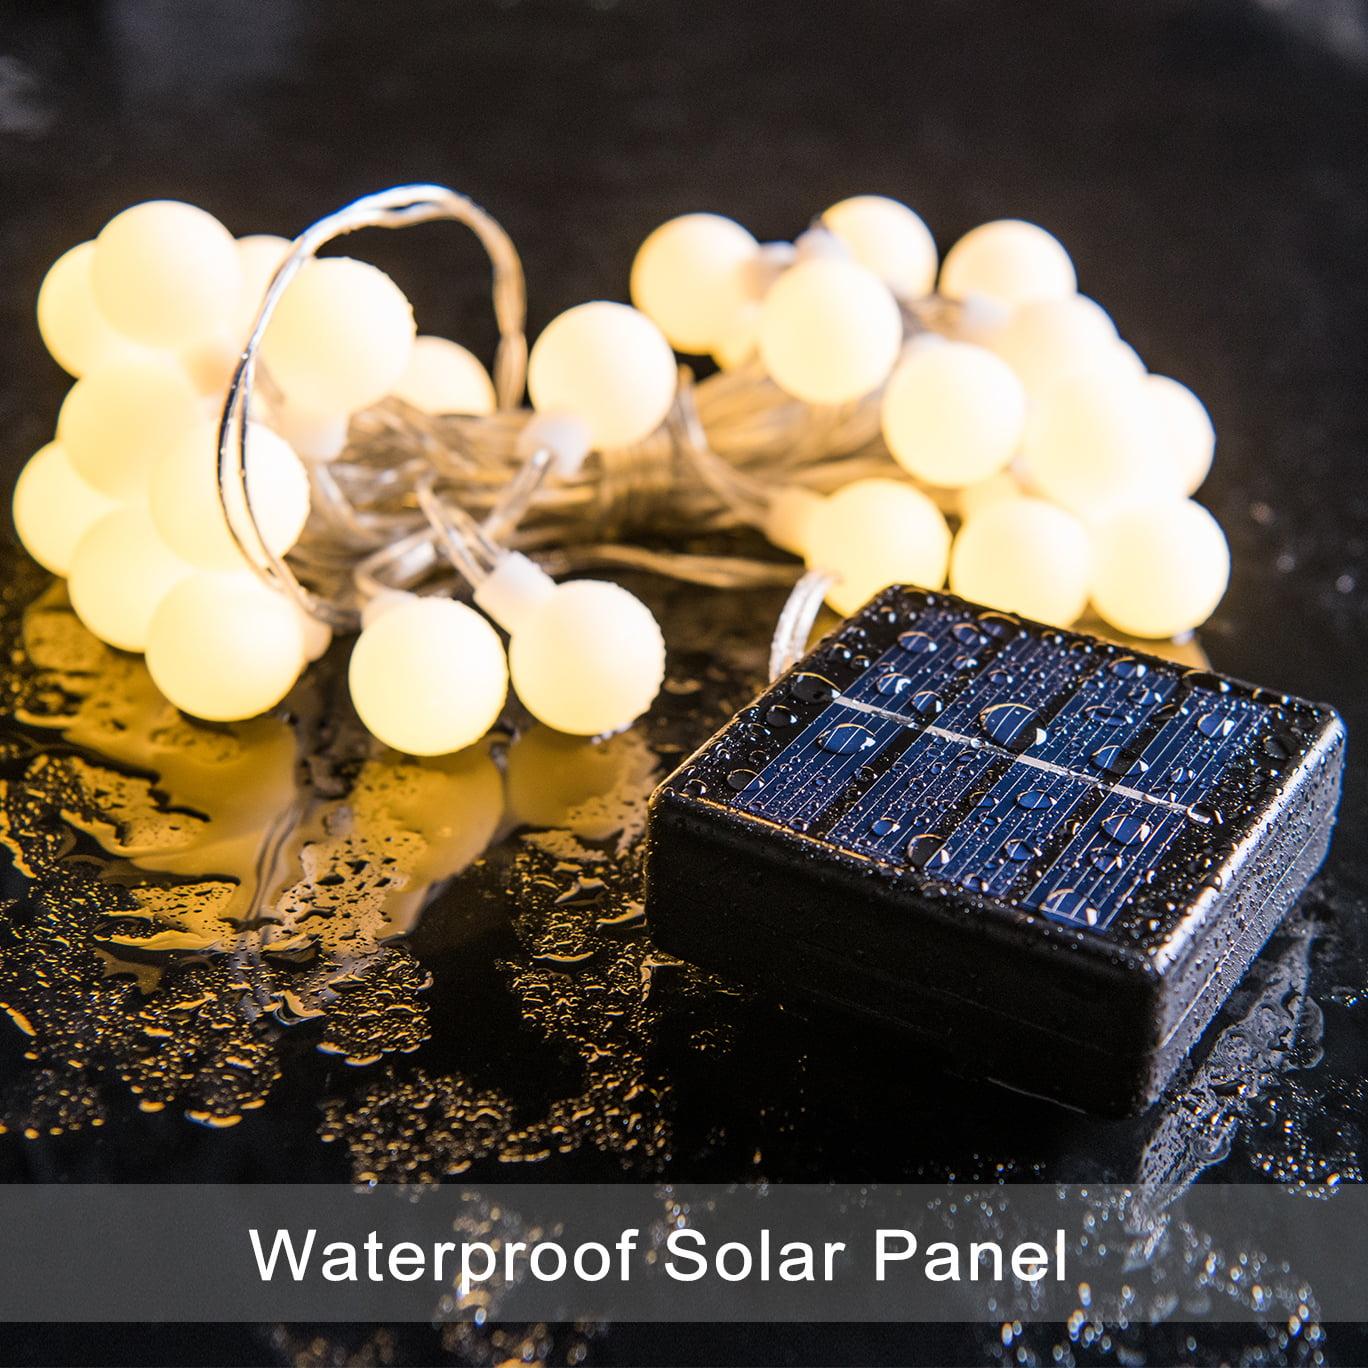 Decornova Warm White Globe String Lights,2 Set of 13 feet 30 LEDs IP44 Waterproof Outdoor Solar Powered LED... by Decornova